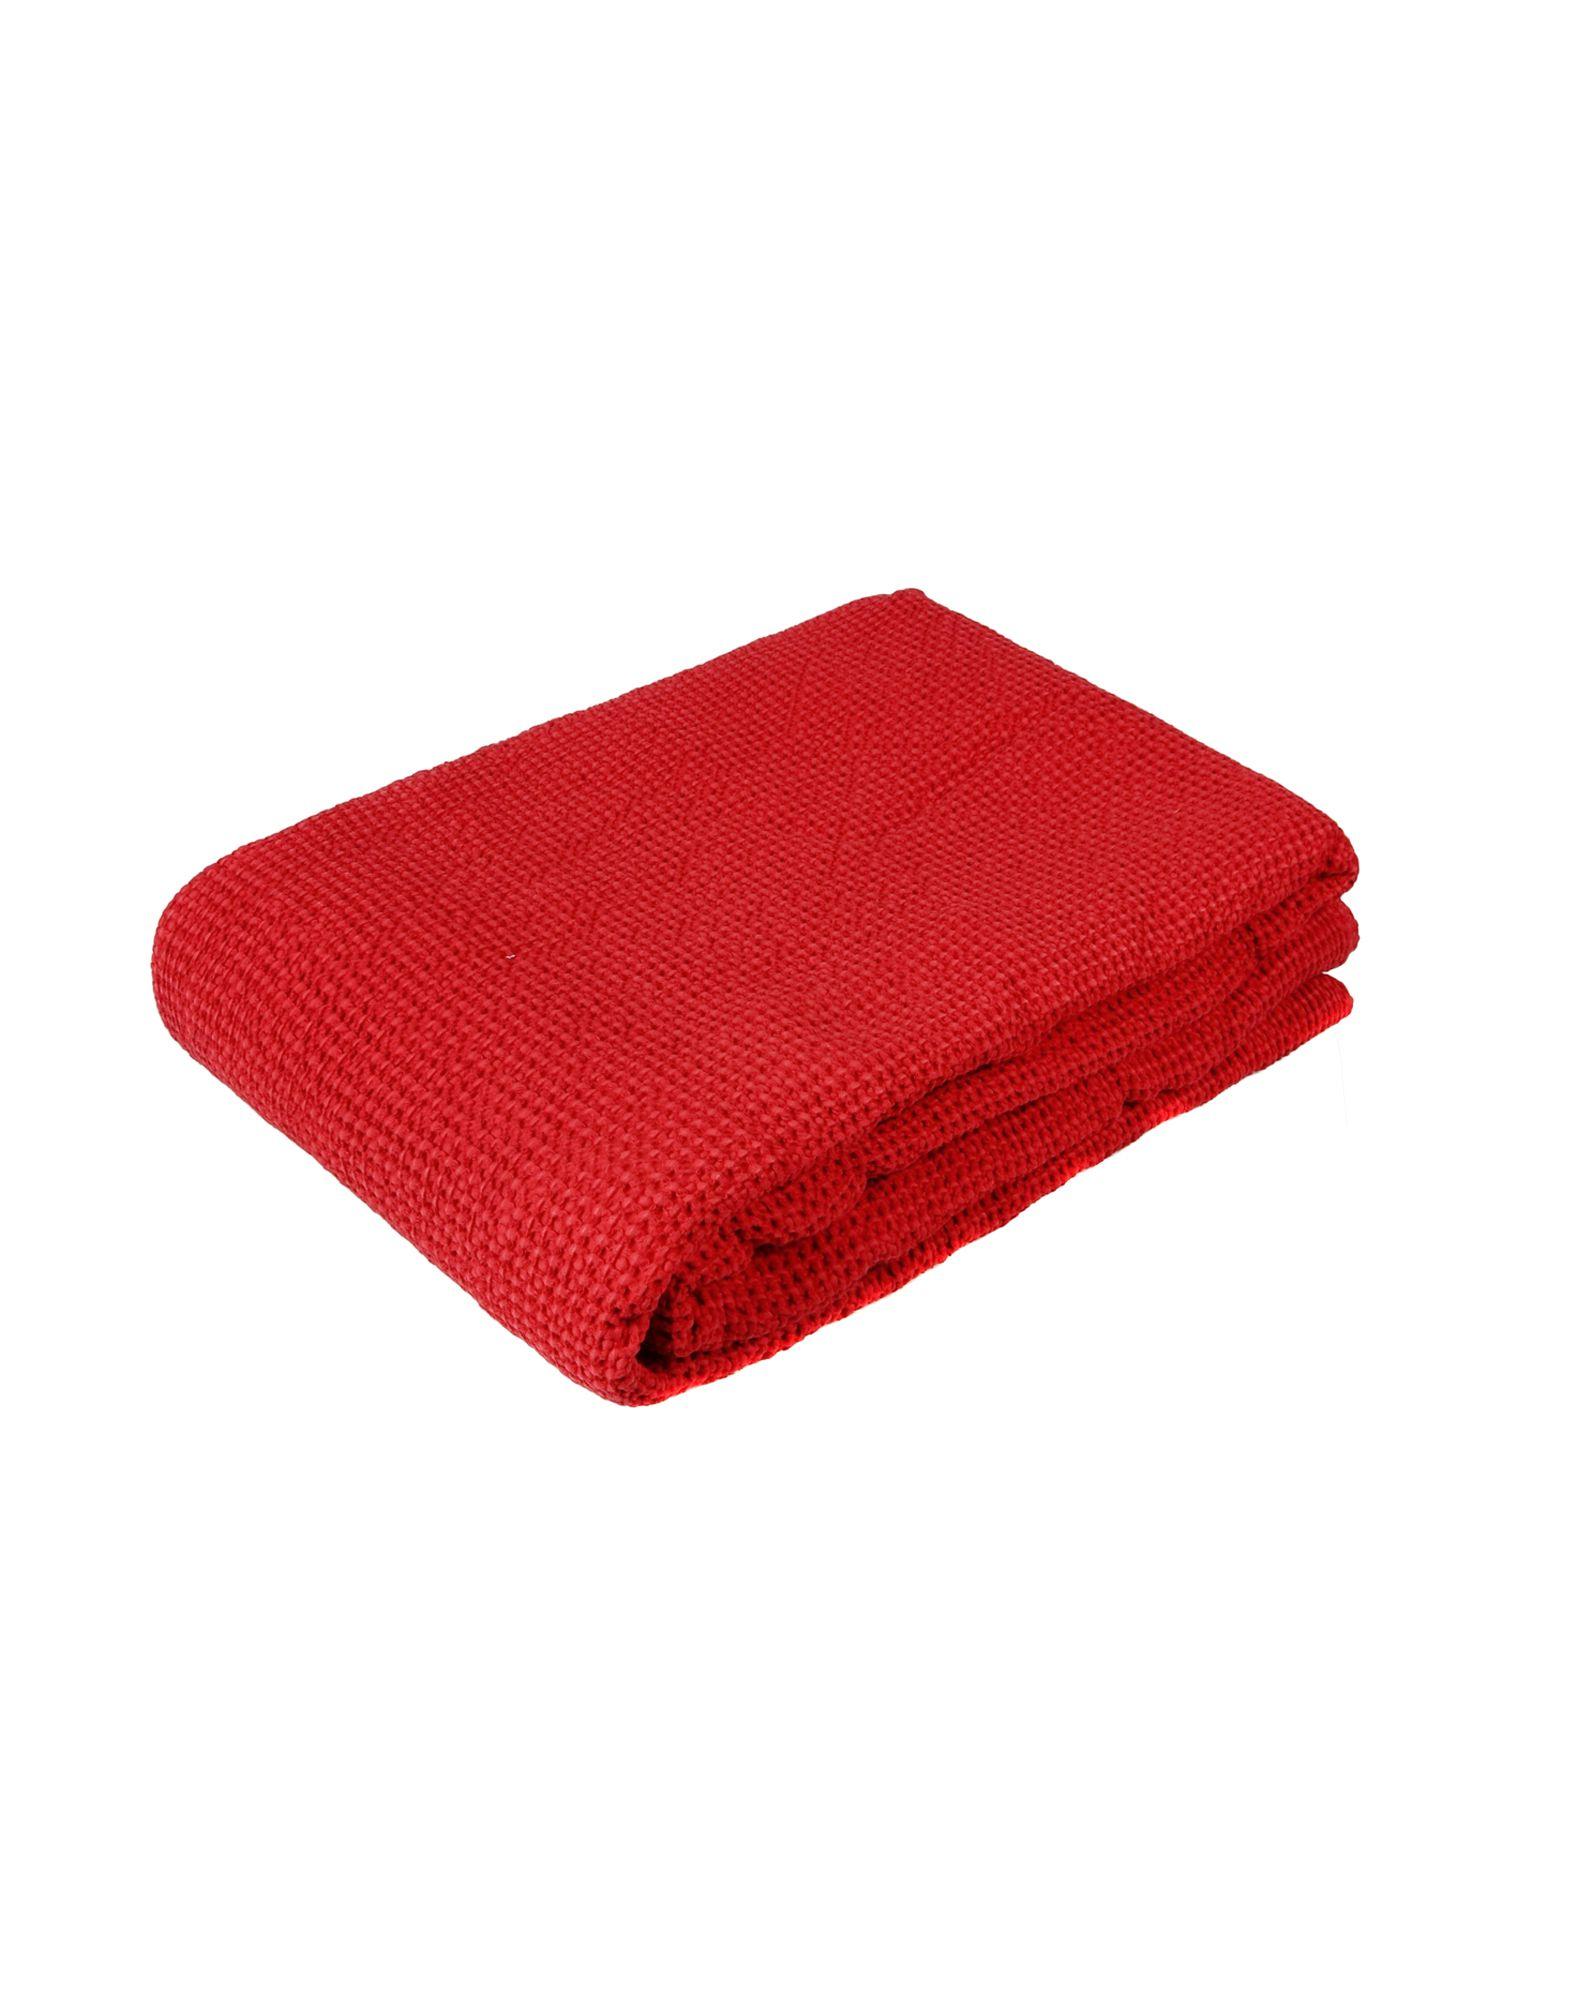 VIVARAISE Unisex Wolldecke Farbe Rot Größe 1